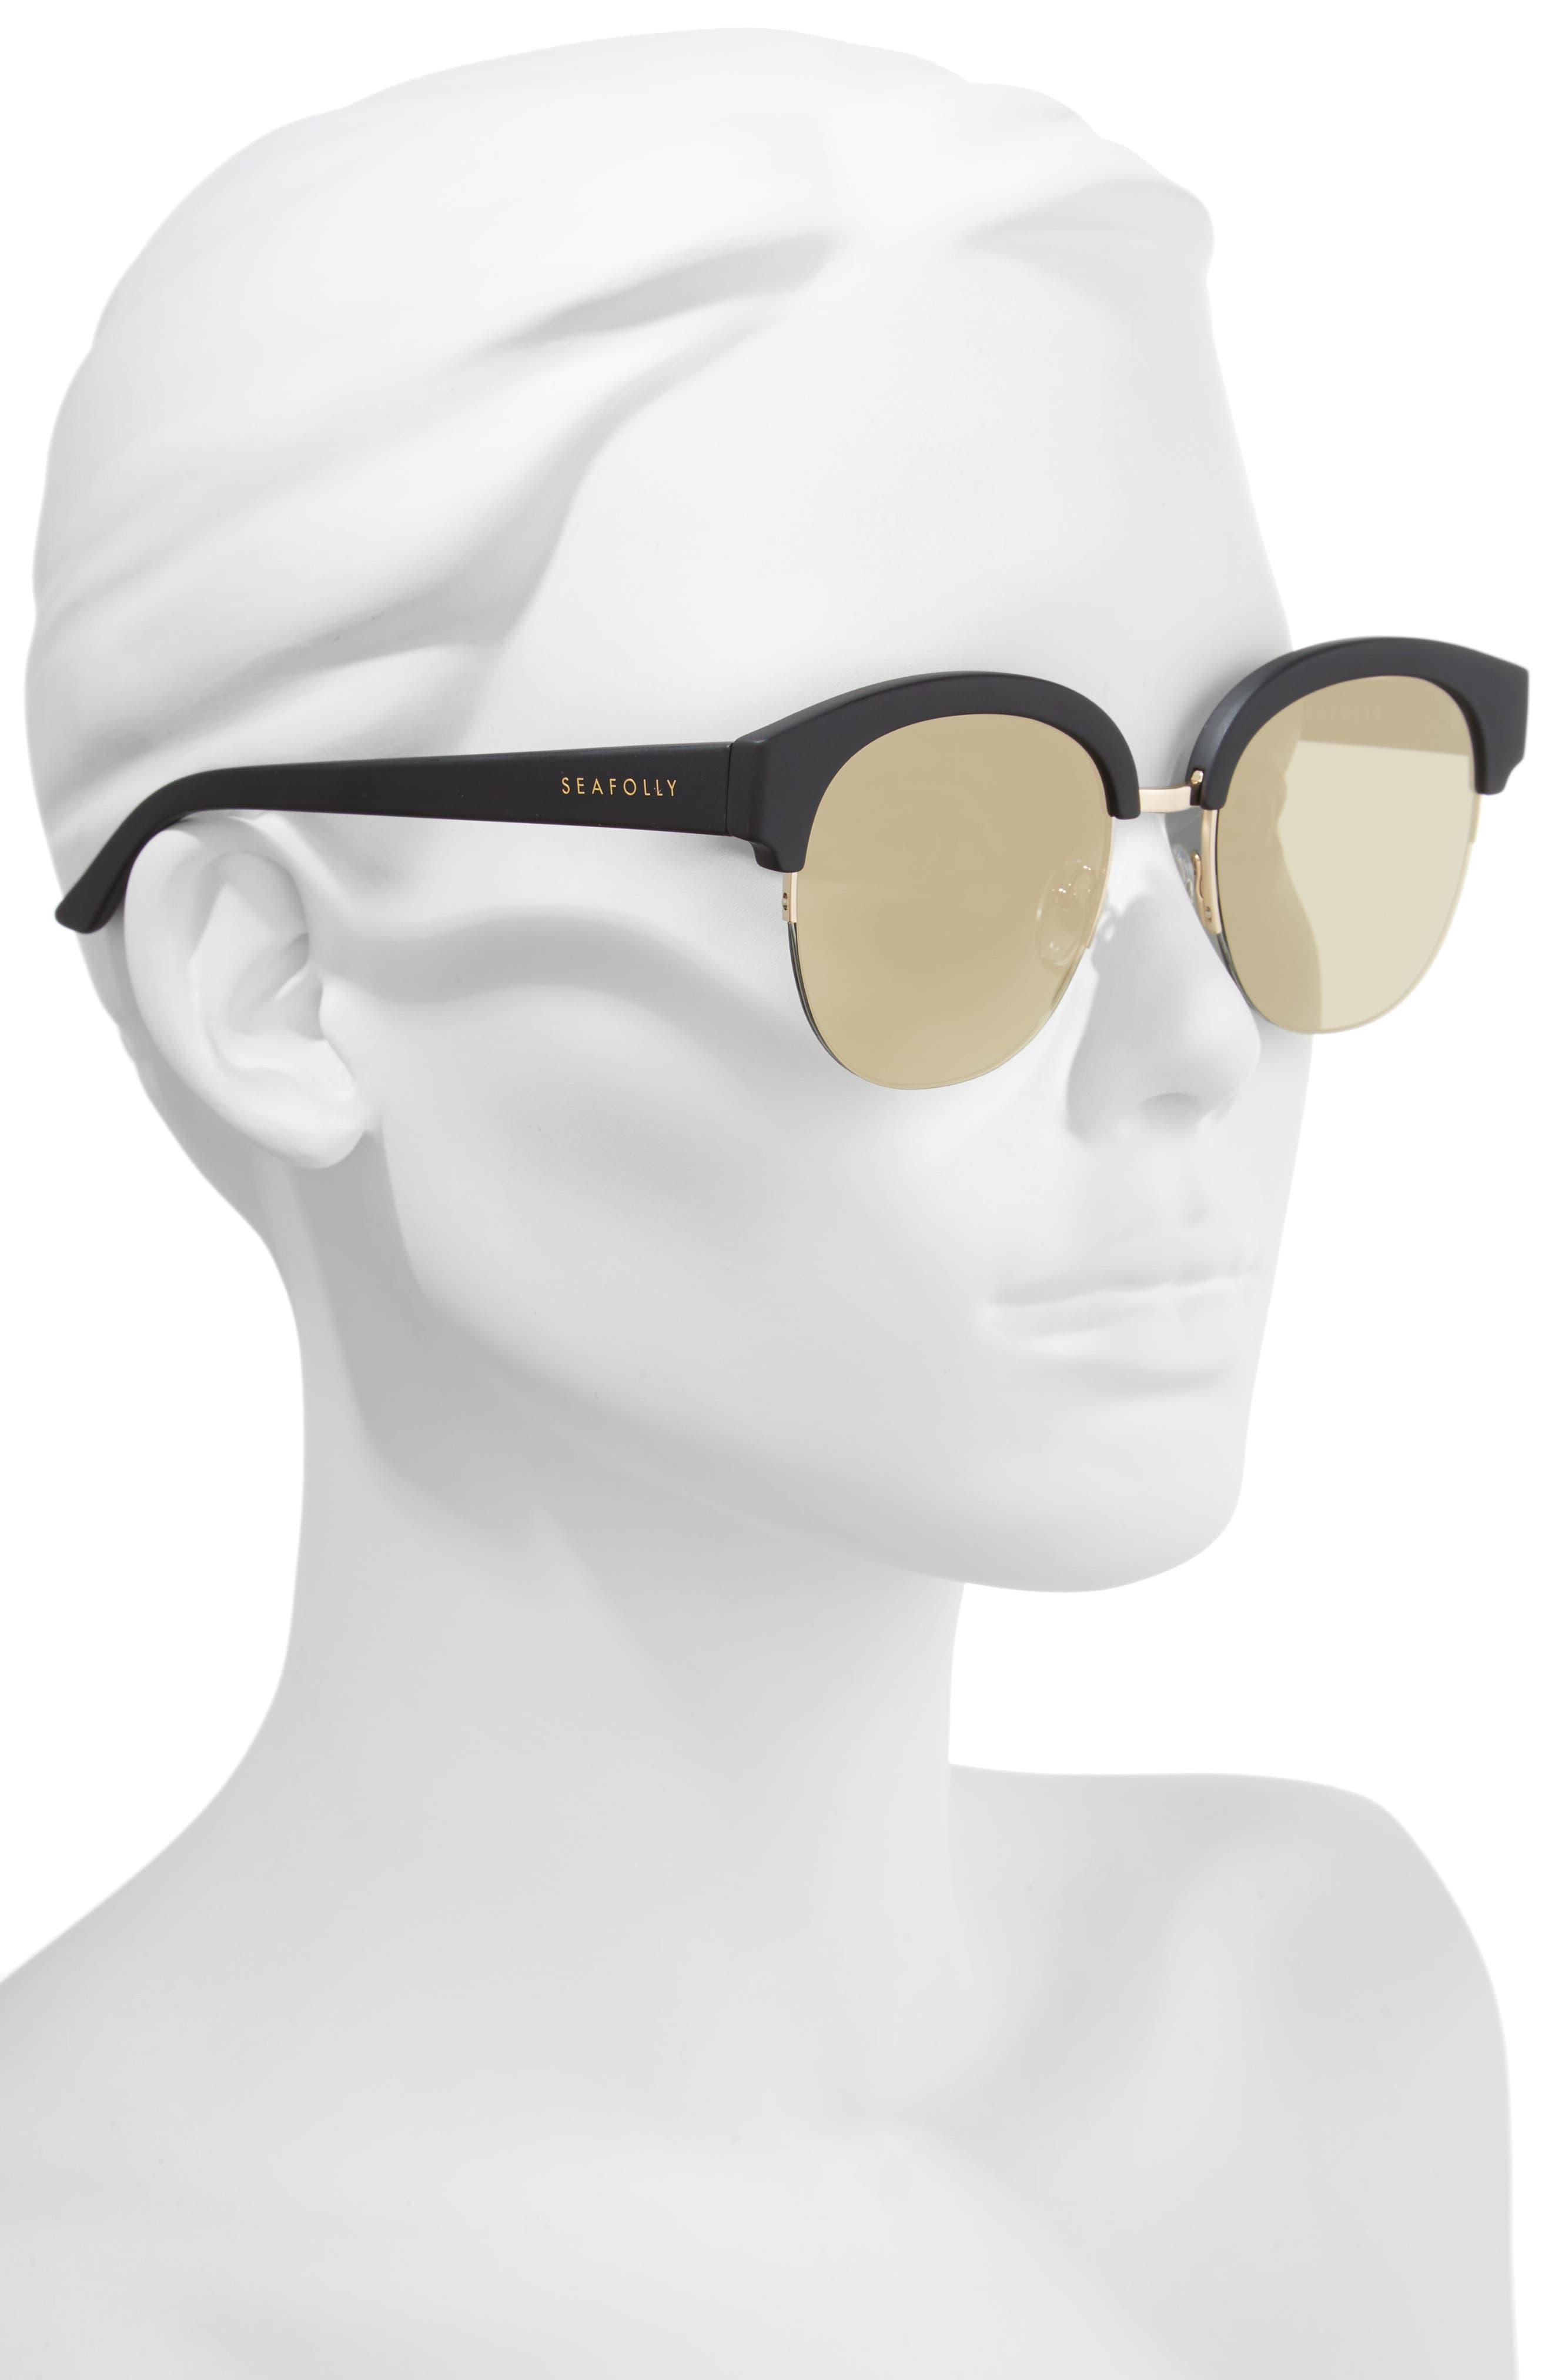 Wategos 53mm Cat Eye Sunglasses,                             Alternate thumbnail 2, color,                             001